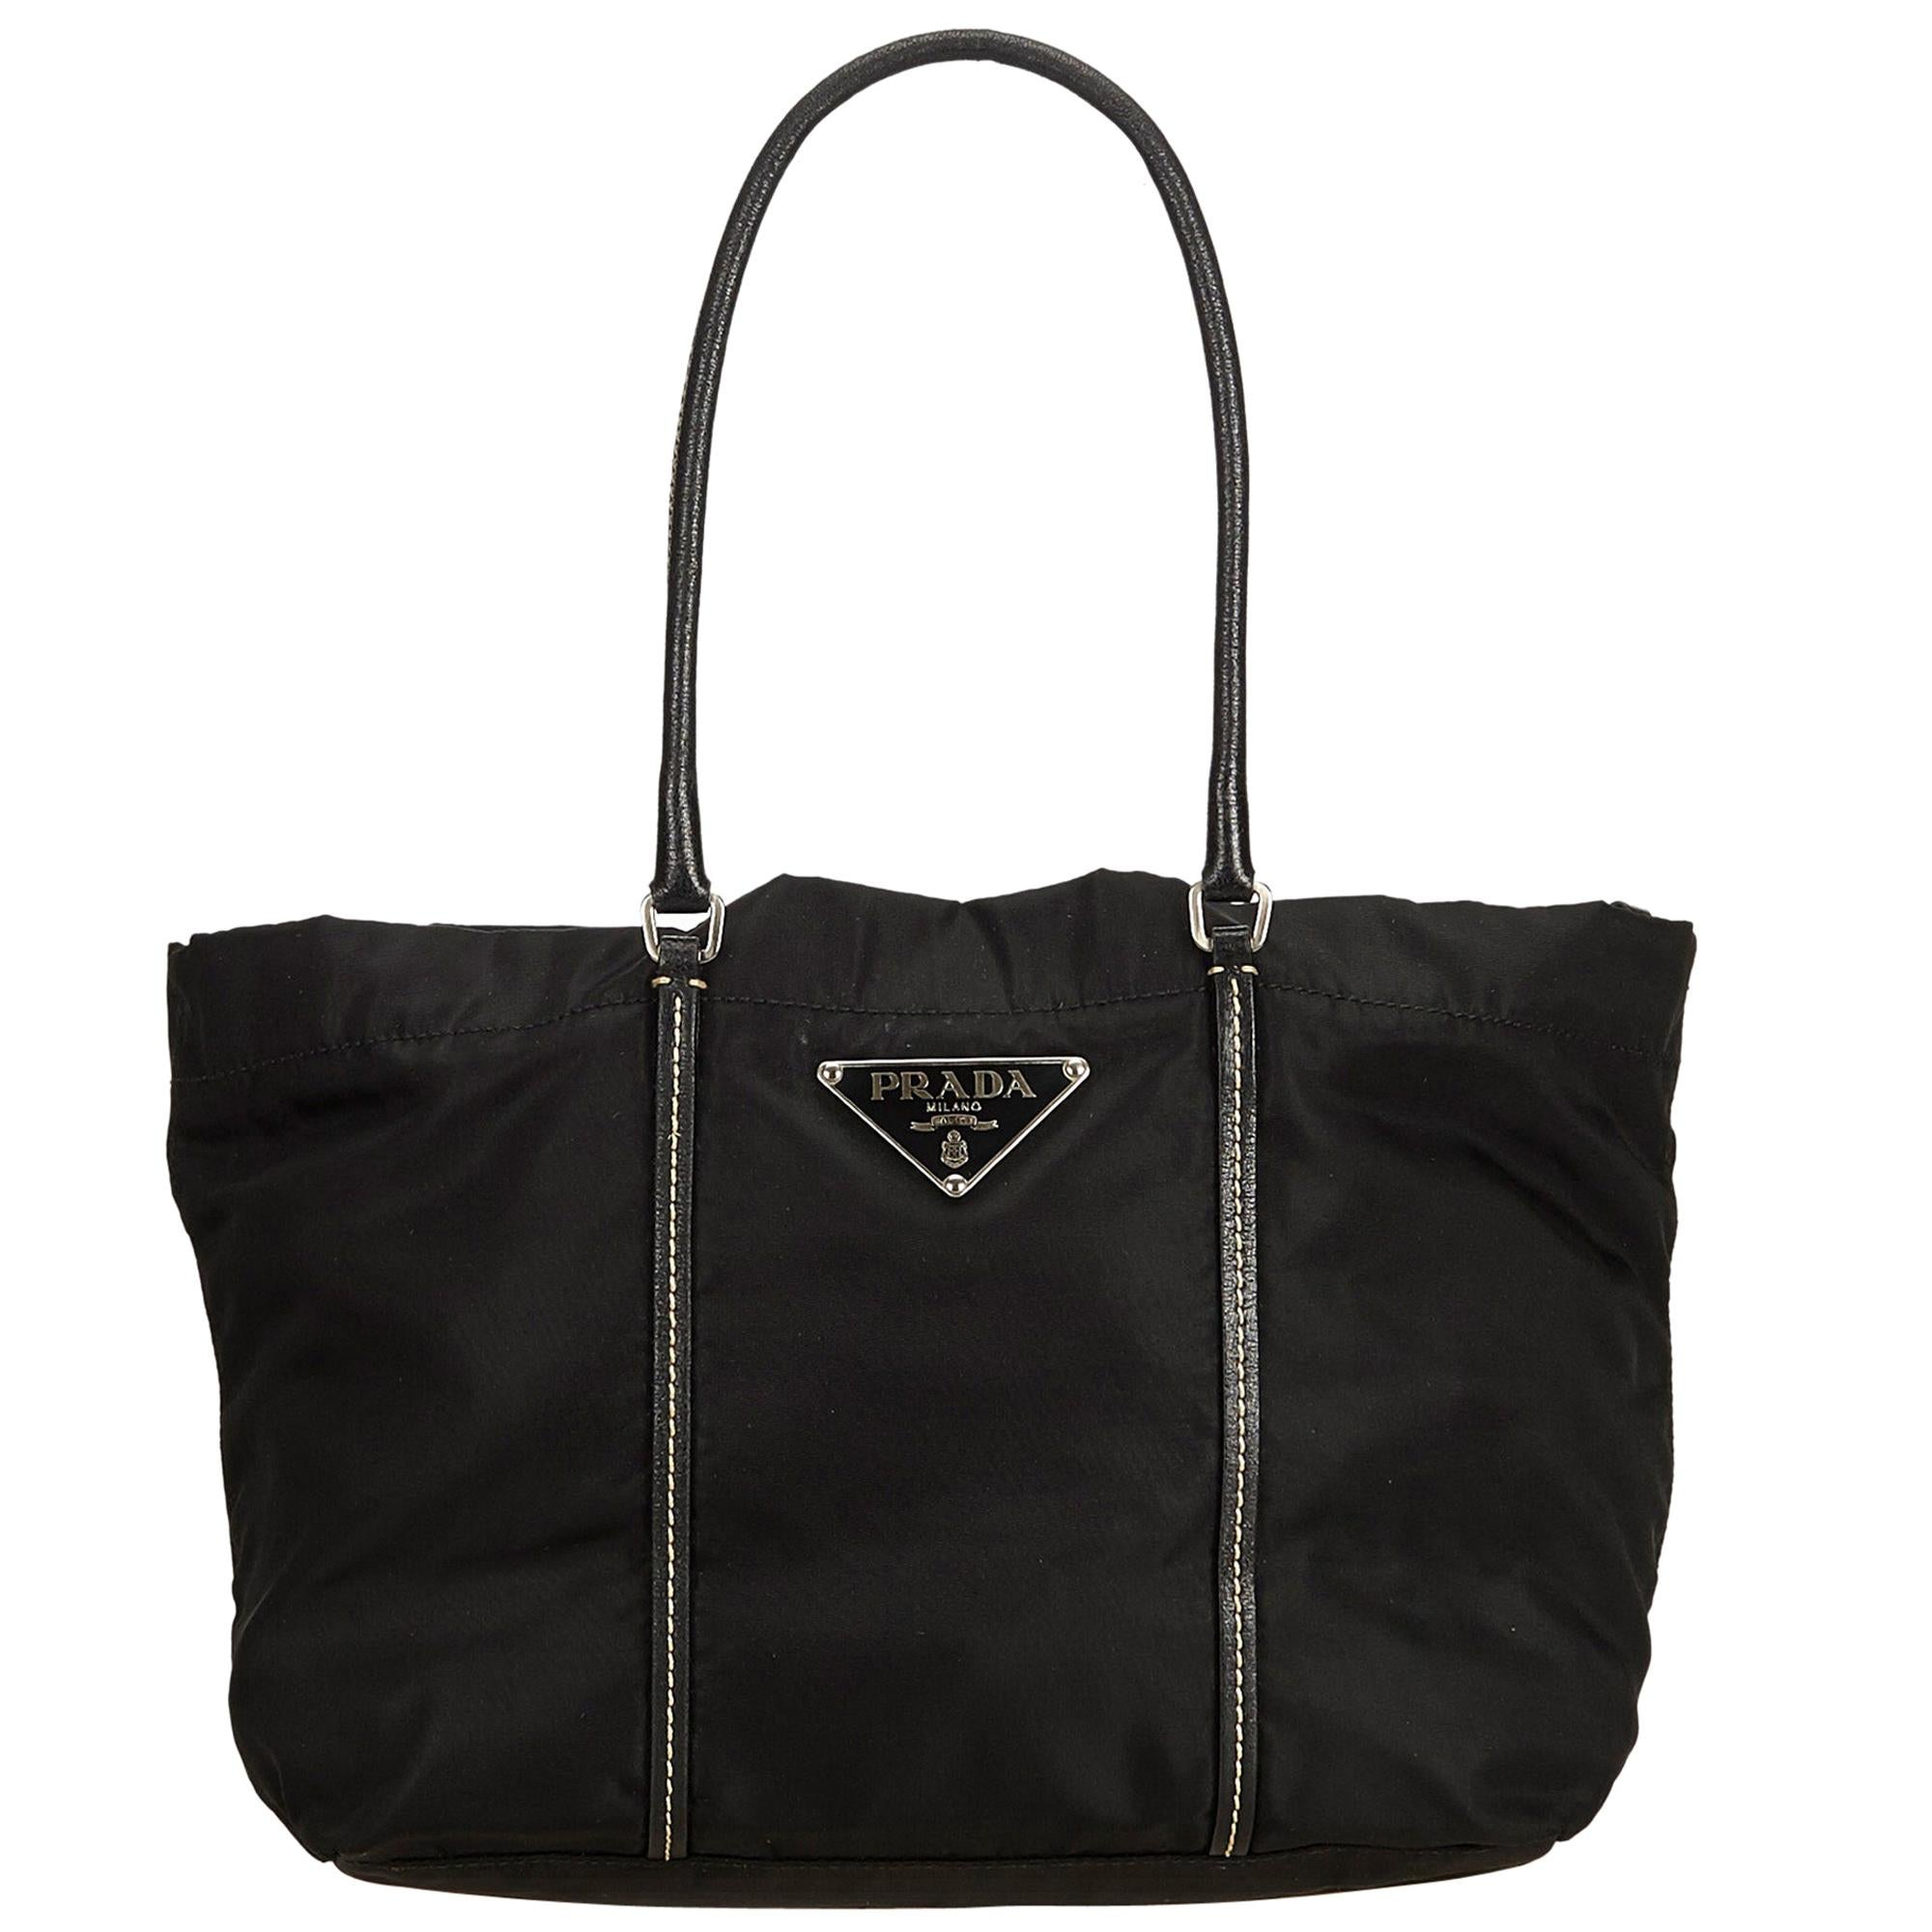 91c779978a21 Vintage Prada Handbags and Purses - 1,245 For Sale at 1stdibs